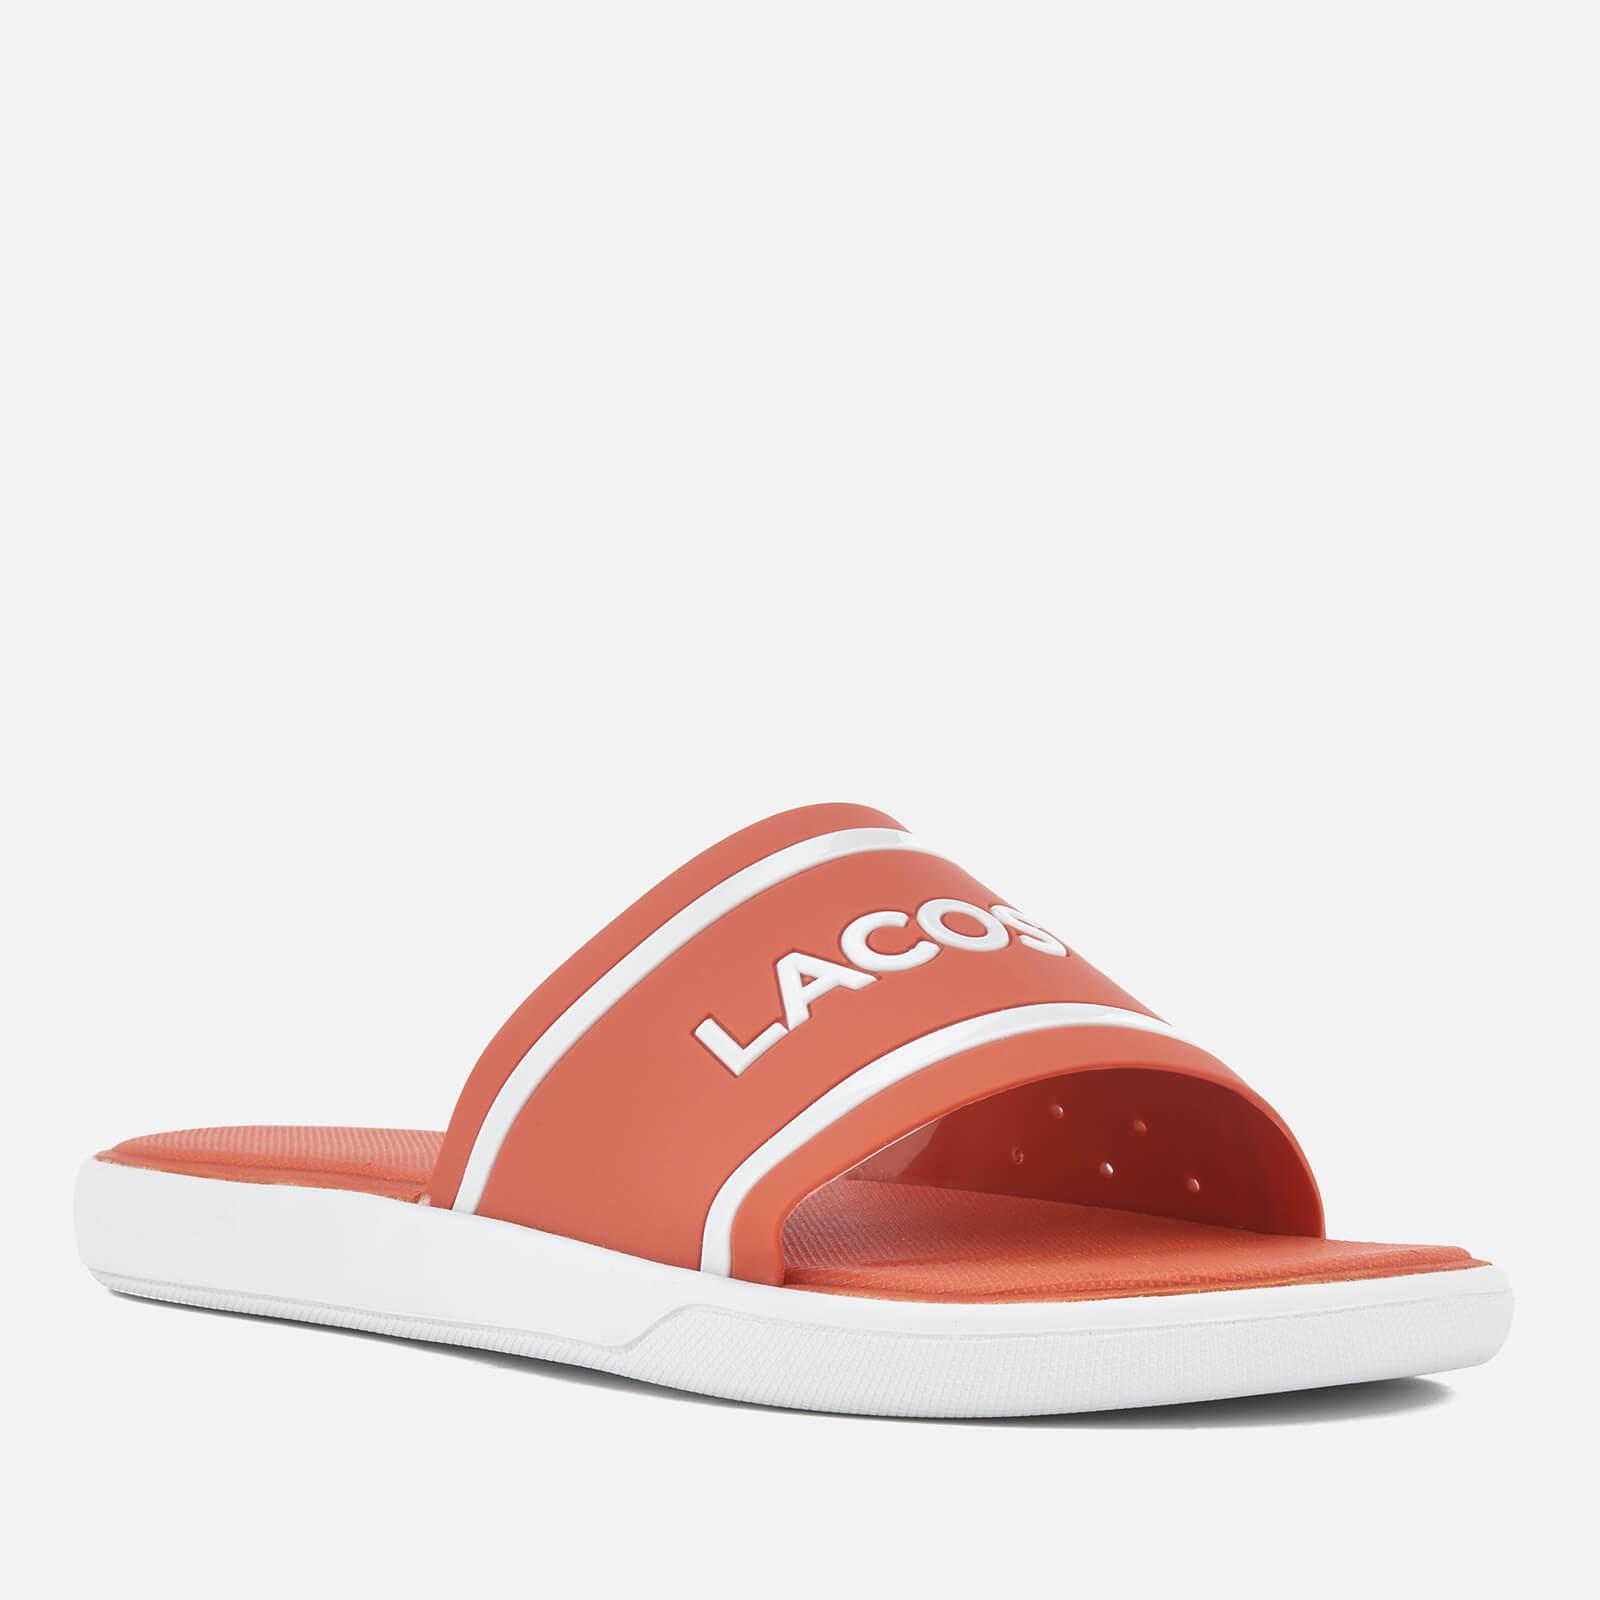 924853bcee6f7 Lacoste - Pink L.30 118 1 Slide Sandals - Lyst. View fullscreen